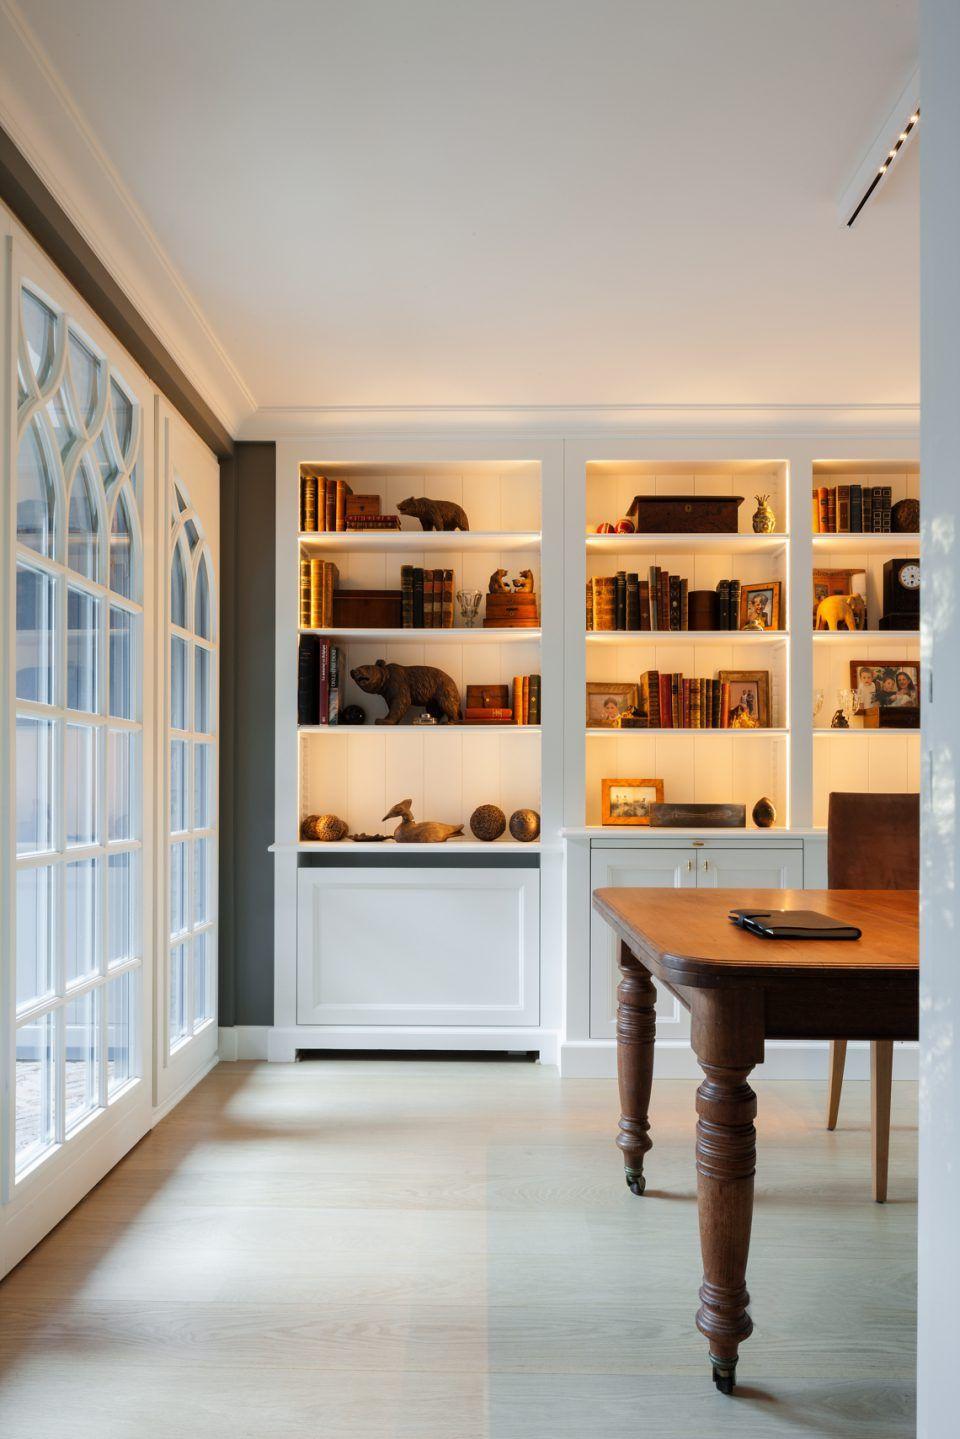 luxe interieurs interieur ideeen woonkamer living room hoogdesign